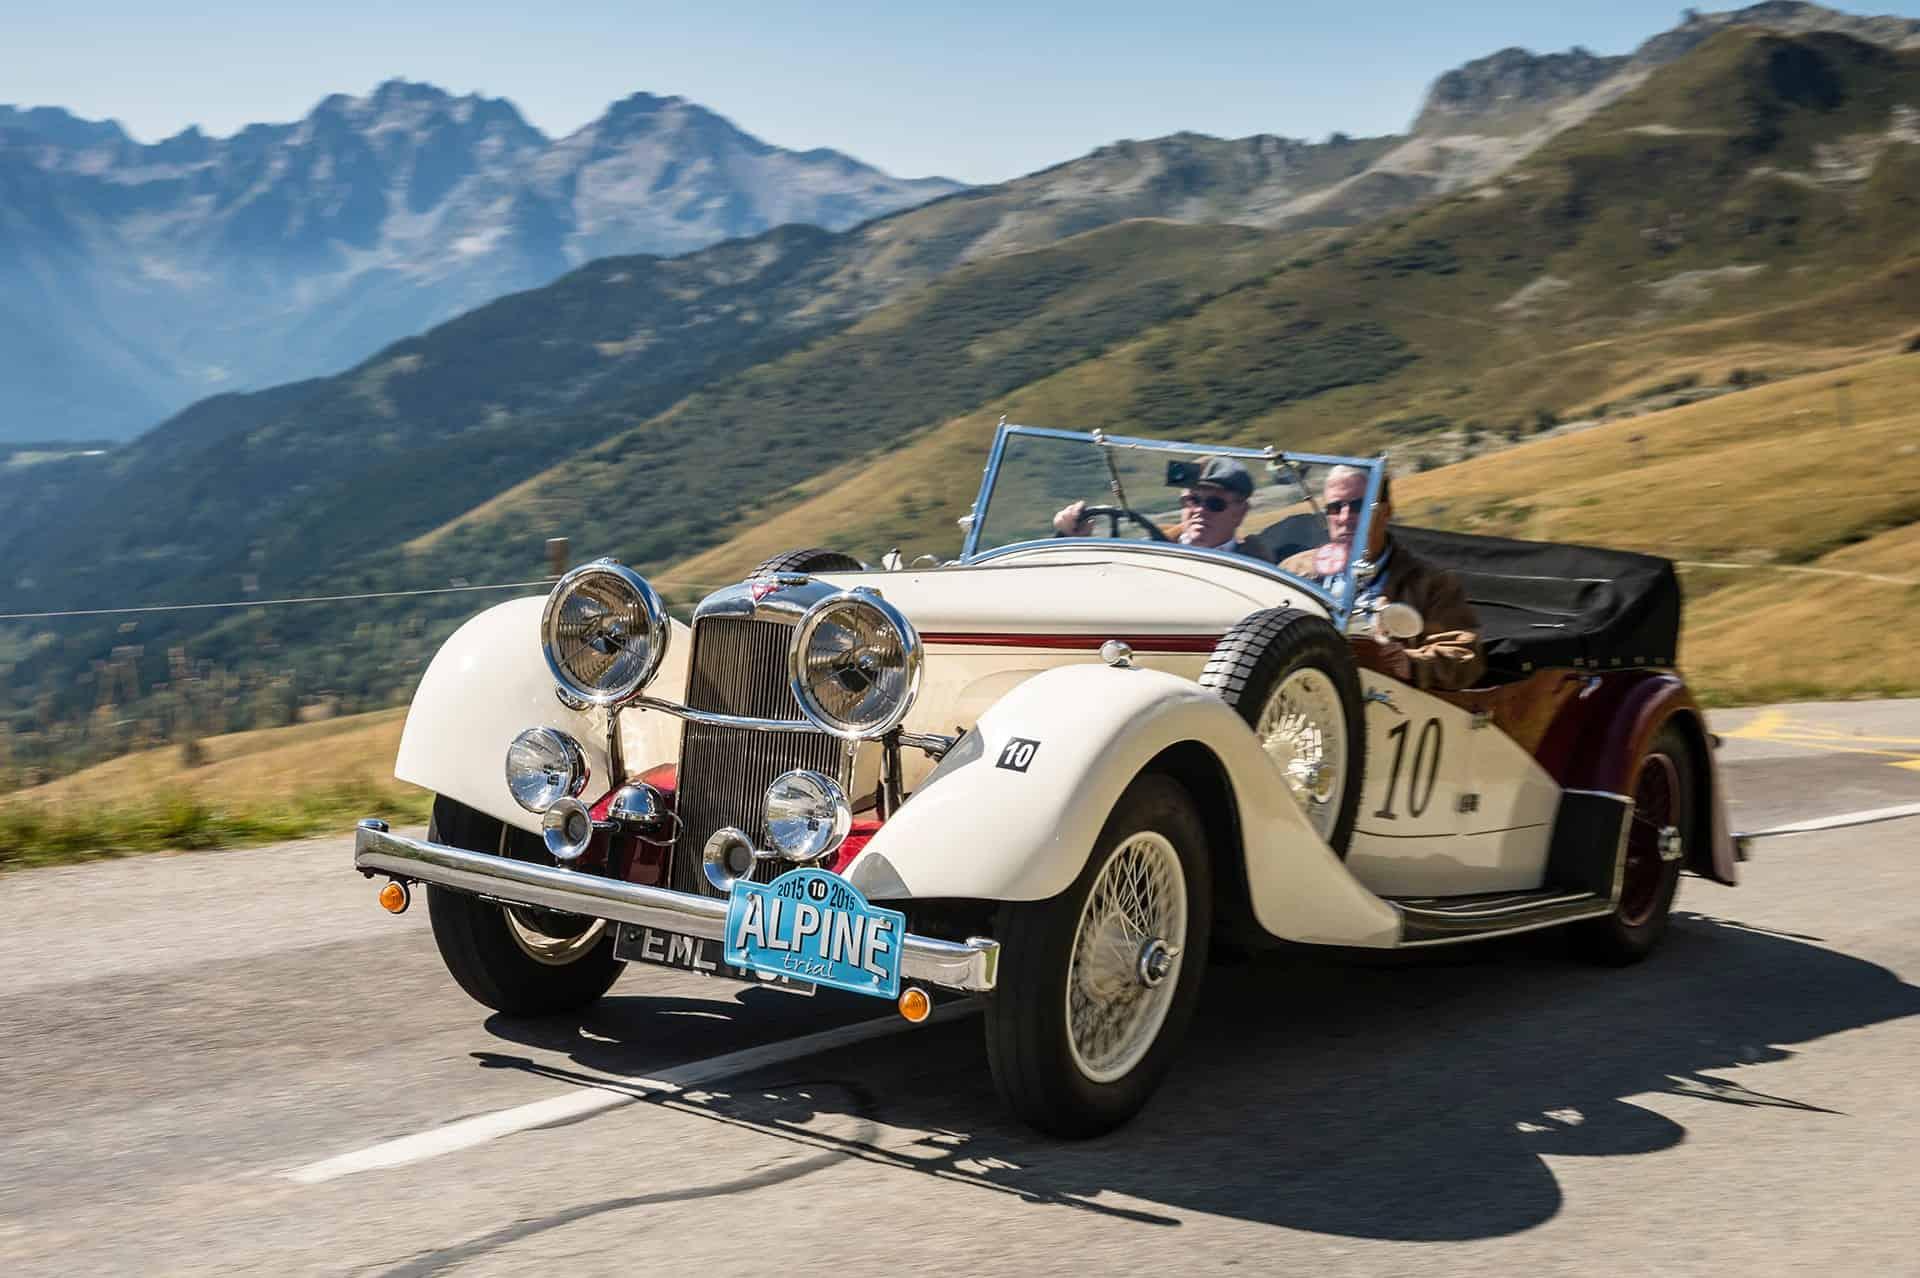 Ian Fyfe 4.3 Rally